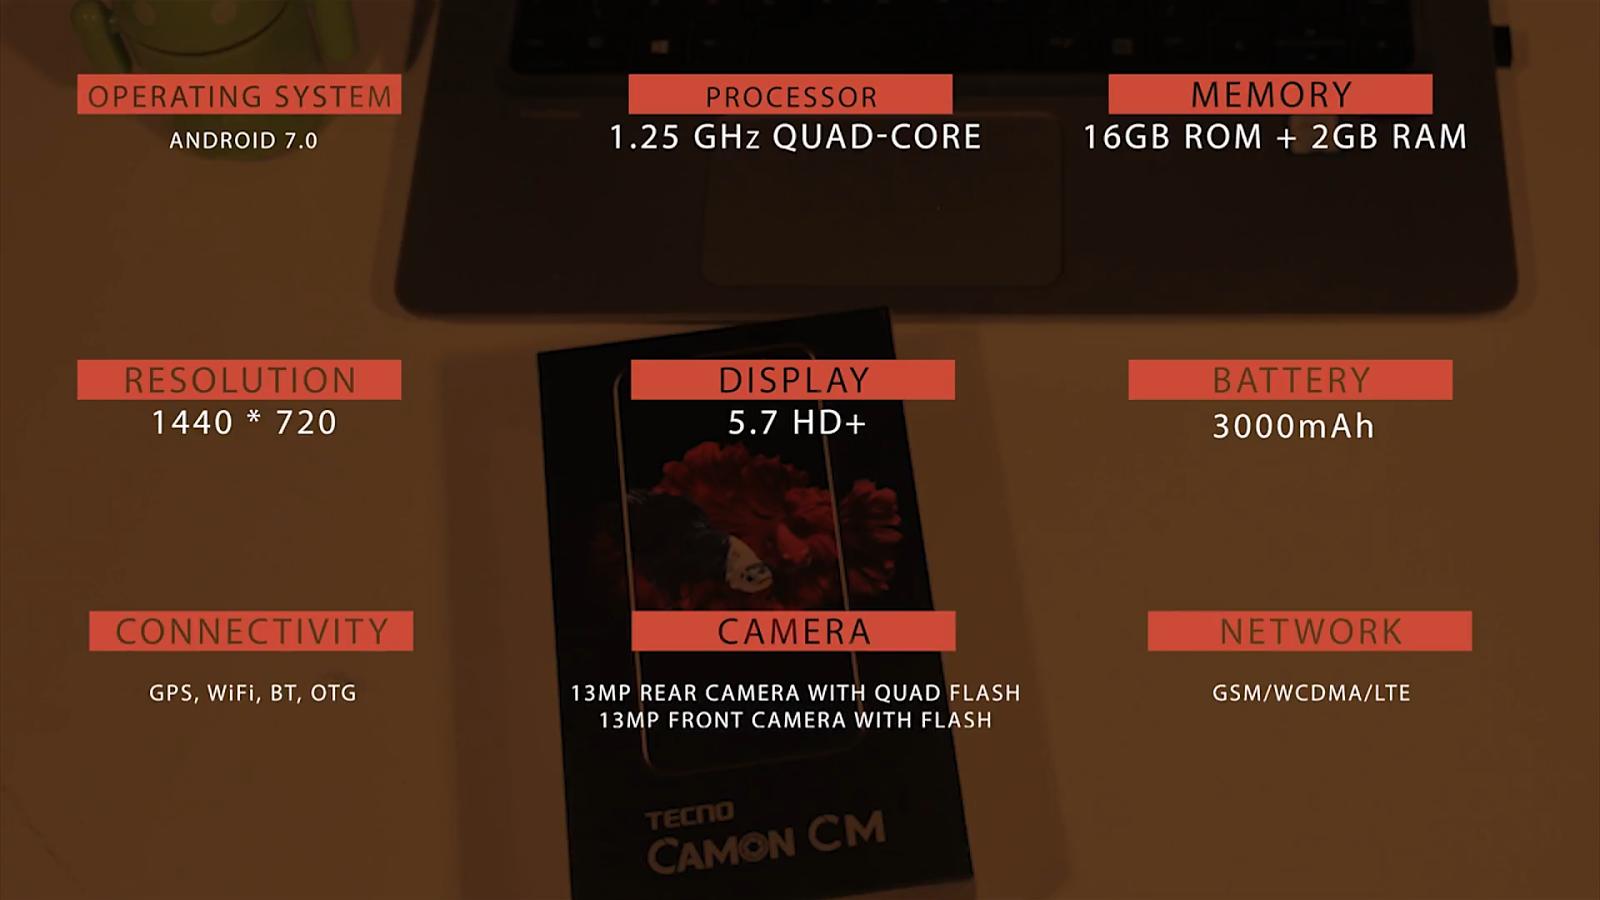 Tecno Camon CM Full specifications